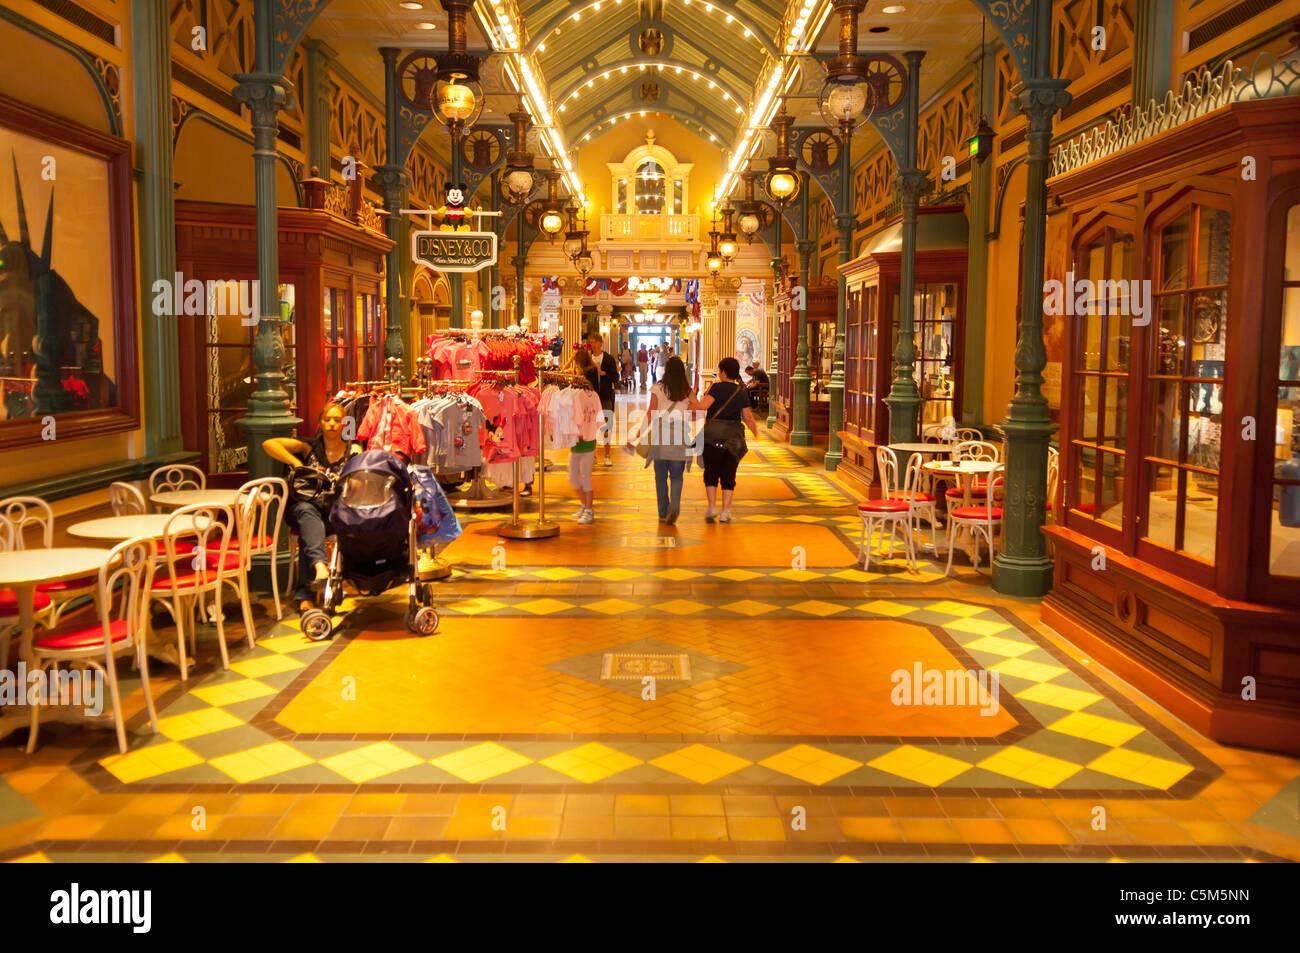 The Liberty Arcade at Disneyland Paris in France - Stock Image